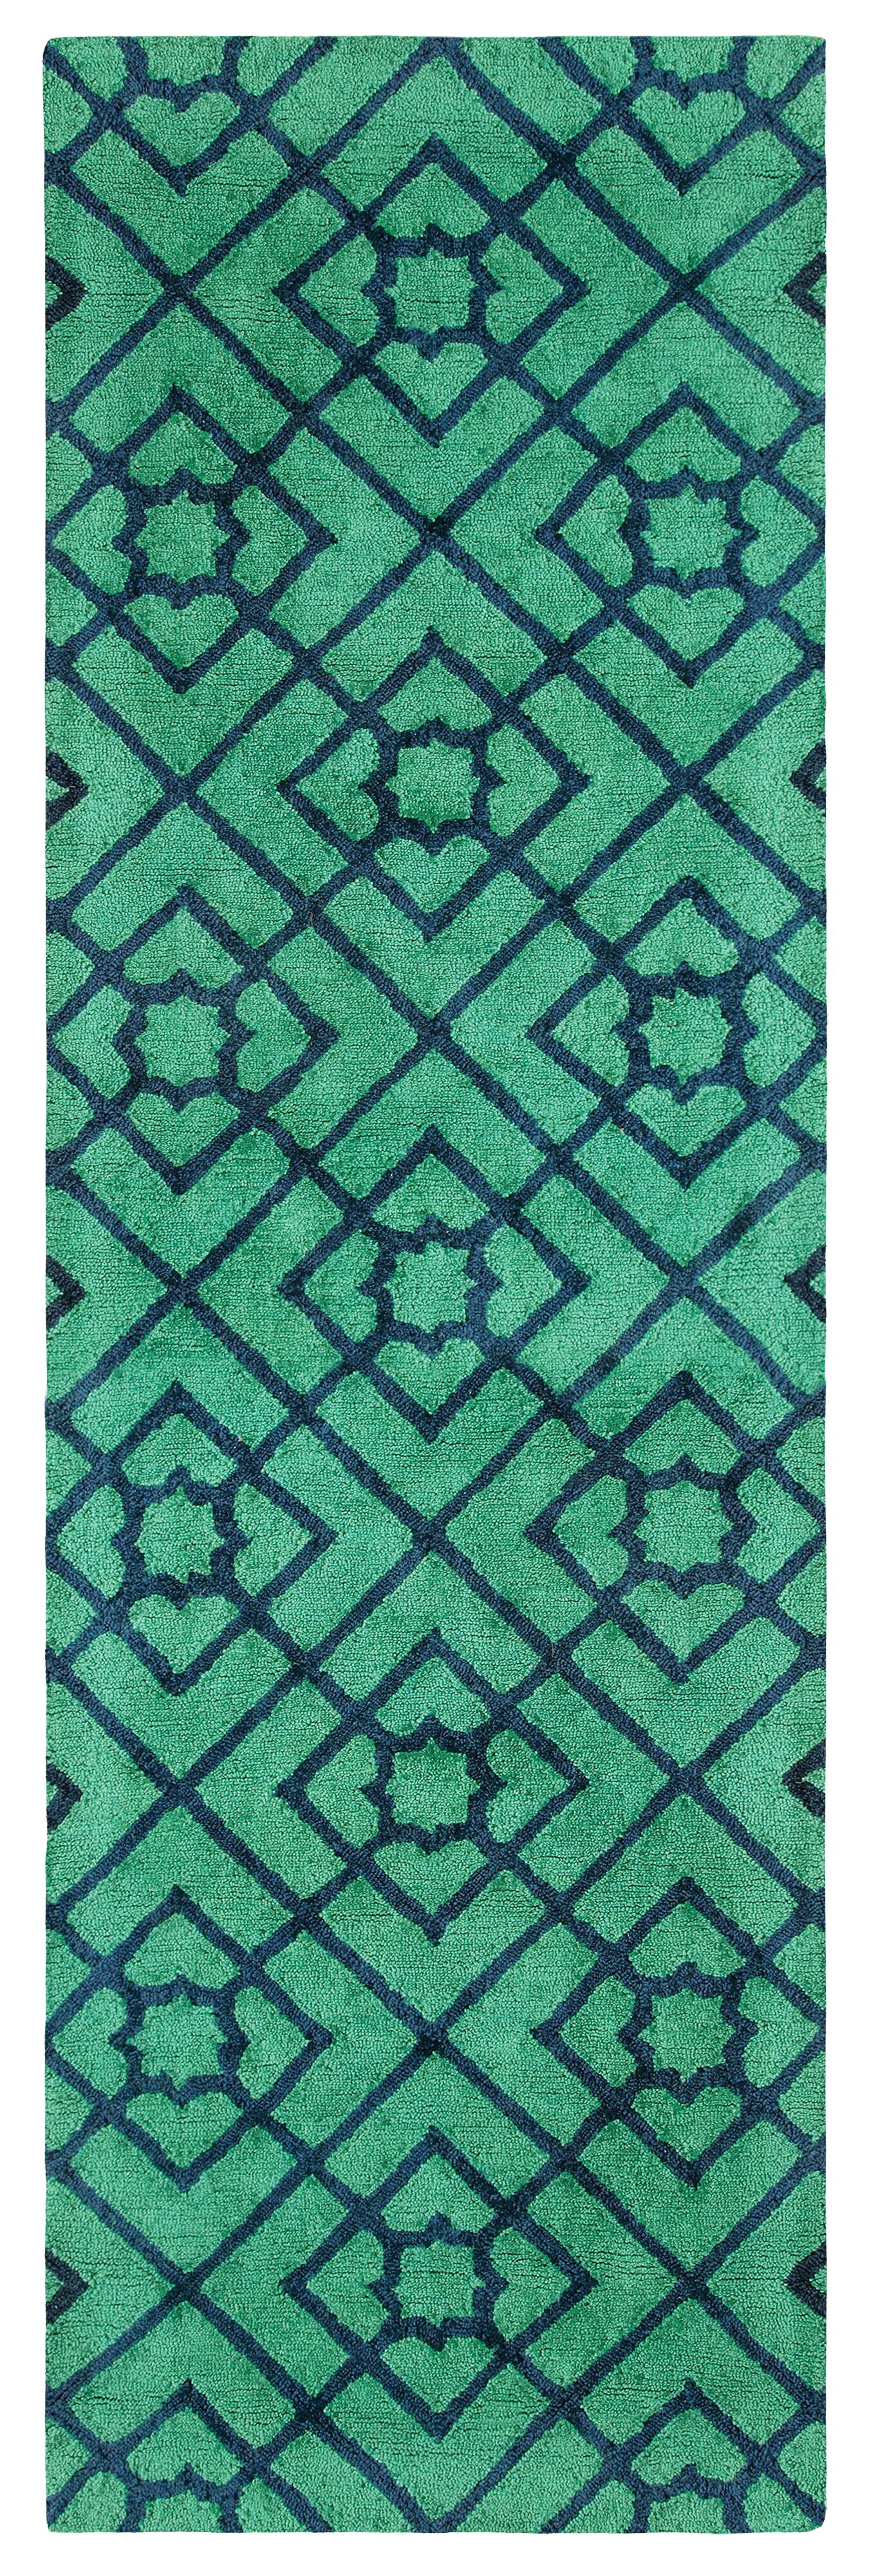 Diamond Lattice Hand-Tufted Green/Blue Area Rug Rug Size: Runner 2'6